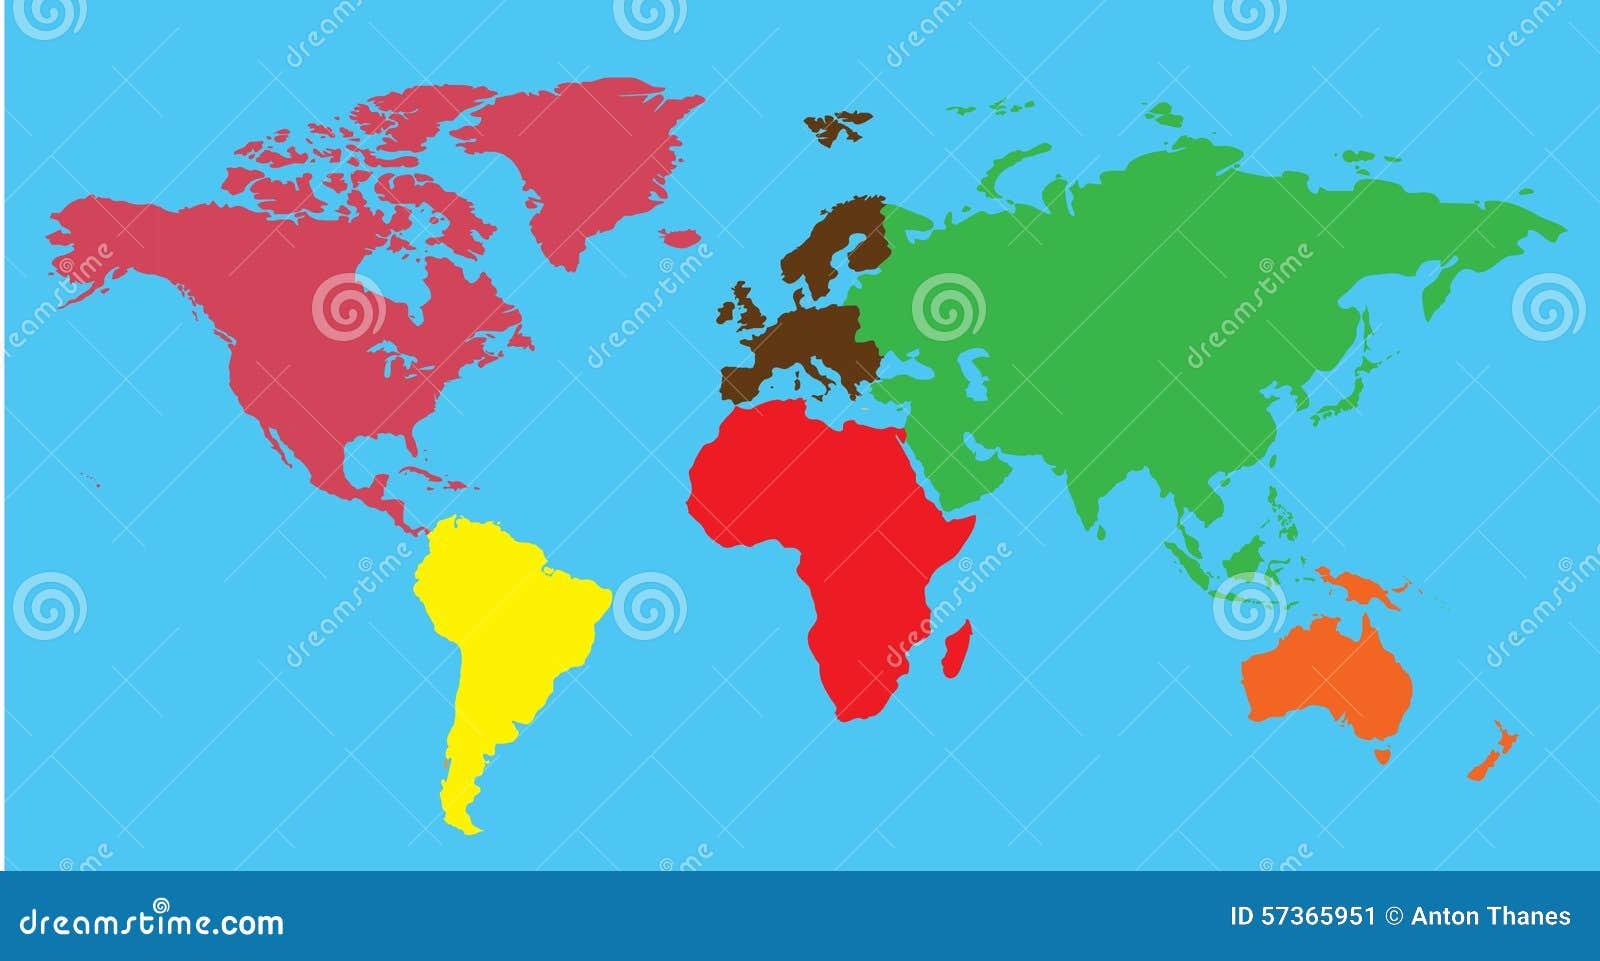 stockfoto continents world map colorful bild. Black Bedroom Furniture Sets. Home Design Ideas